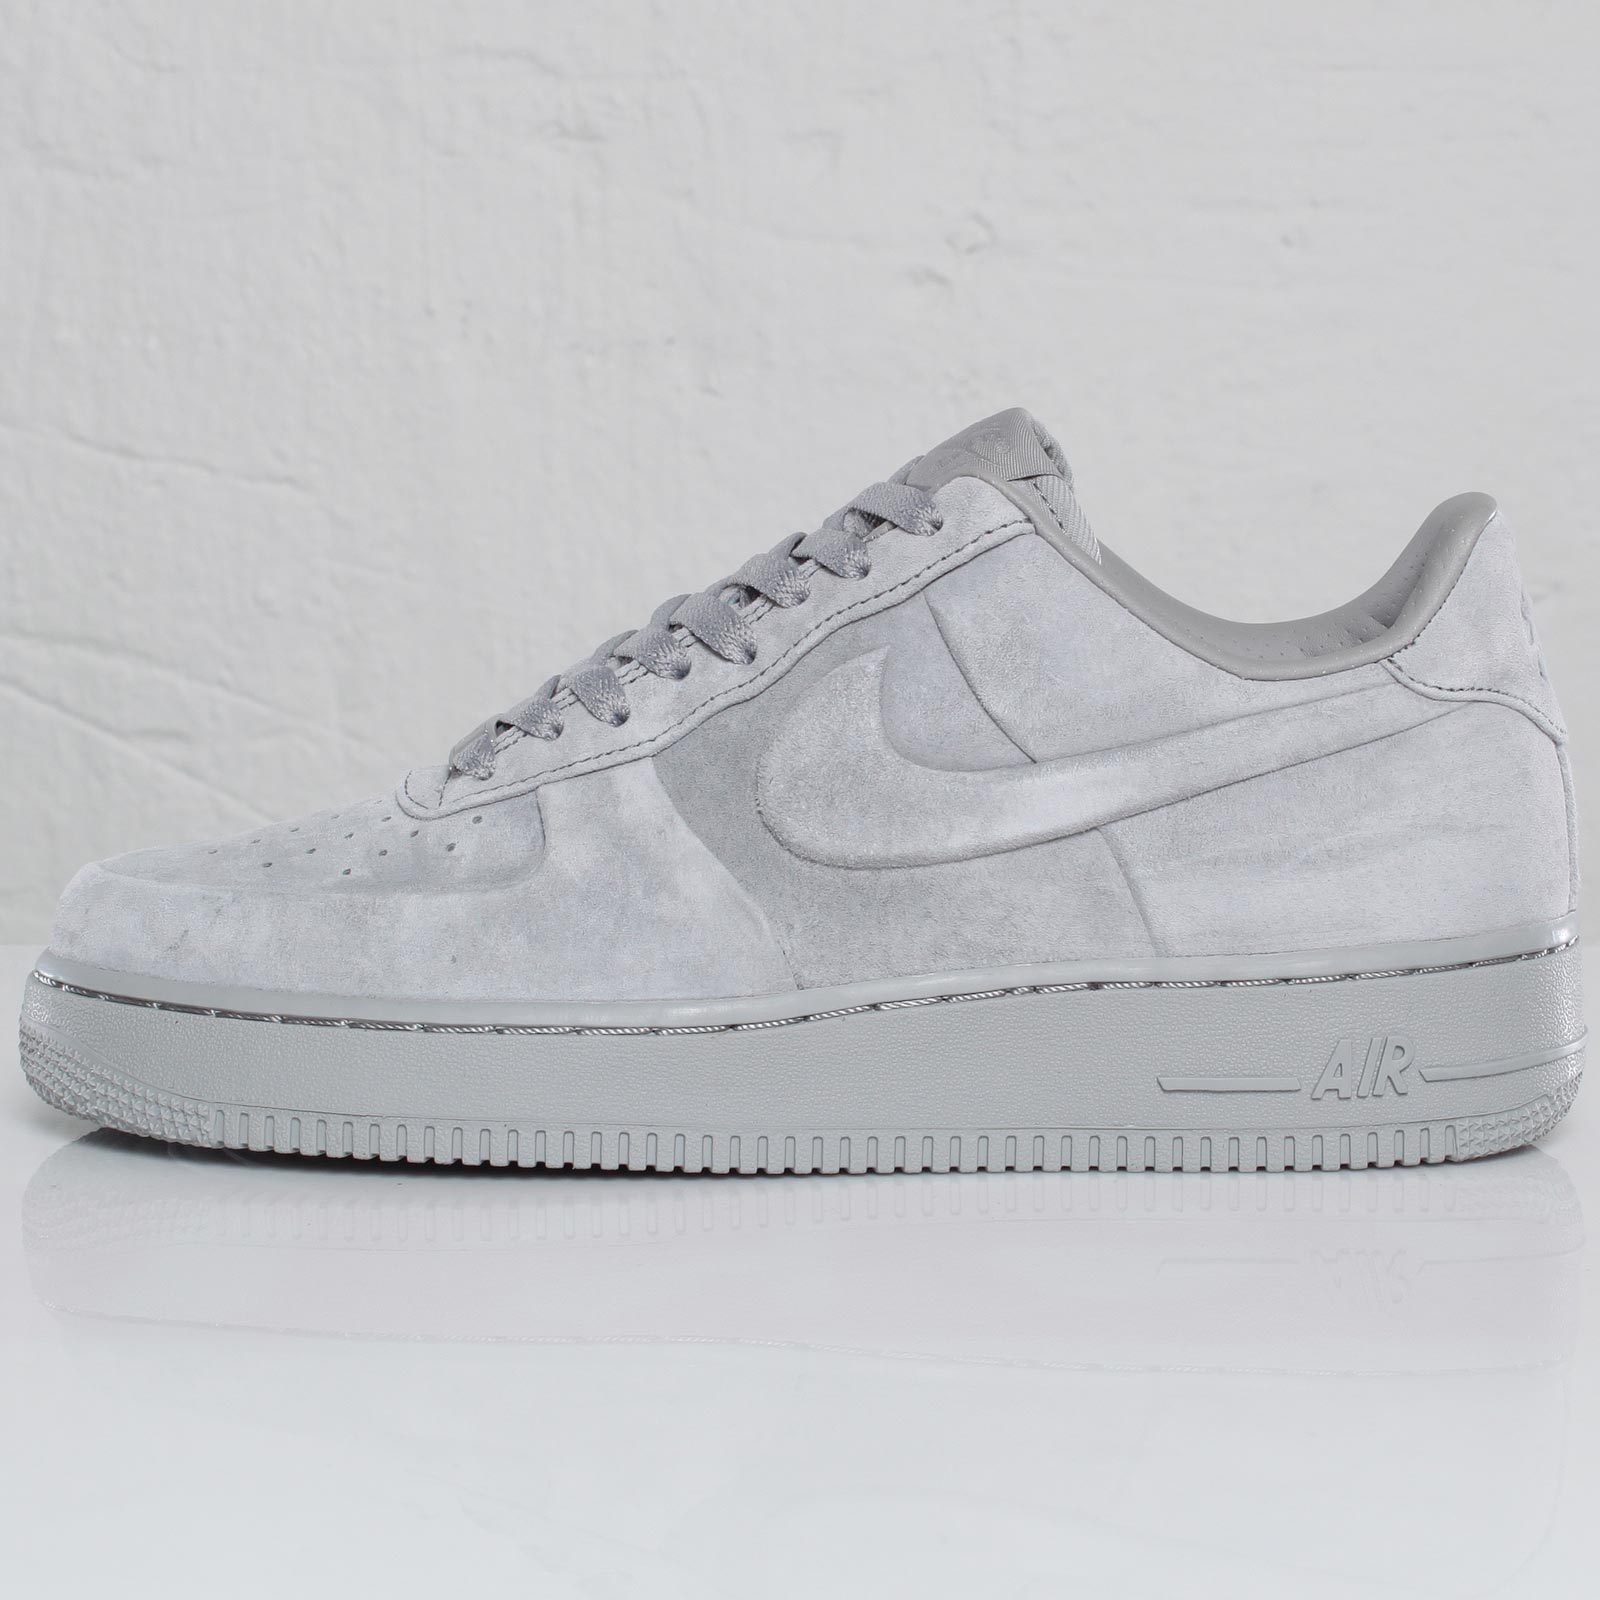 8f6a9effee5ac Nike Air Force 1 Low VT Prm - 102765 - Sneakersnstuff   sneakers &  streetwear online since 1999